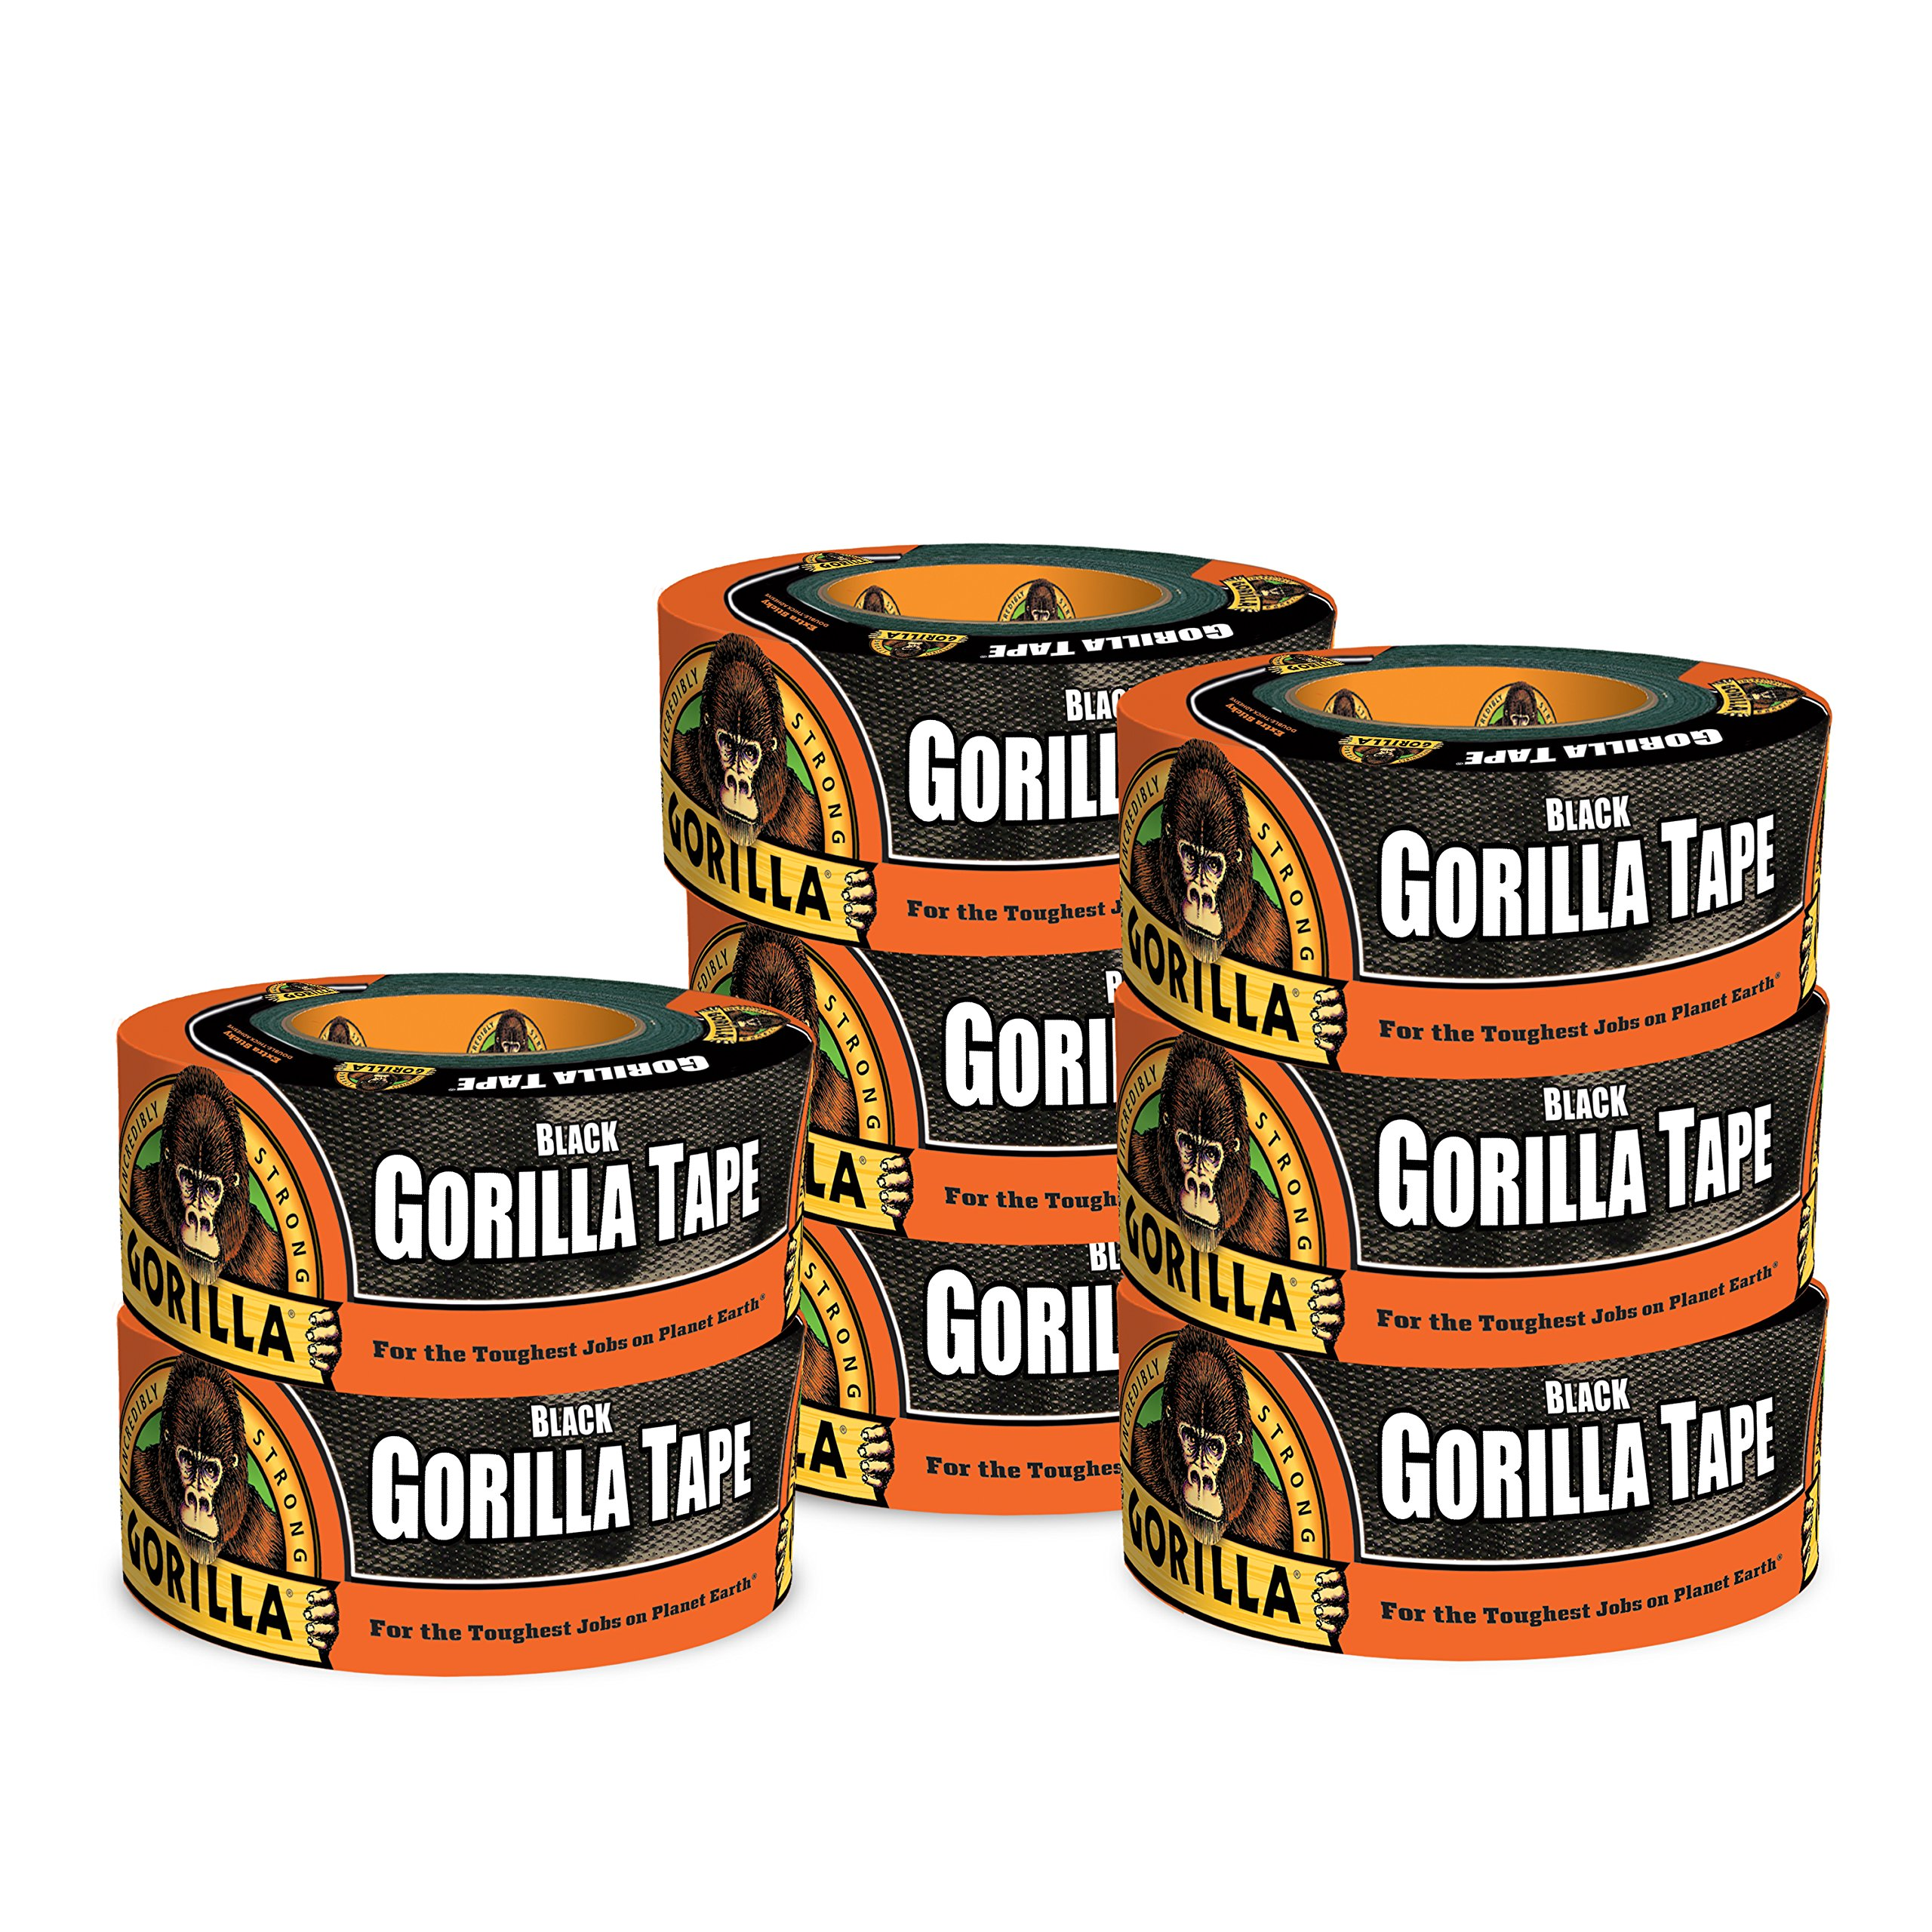 Gorilla Tape, Black Duct Tape, 1.88'' x 12 yd, Black, (Pack of 8)